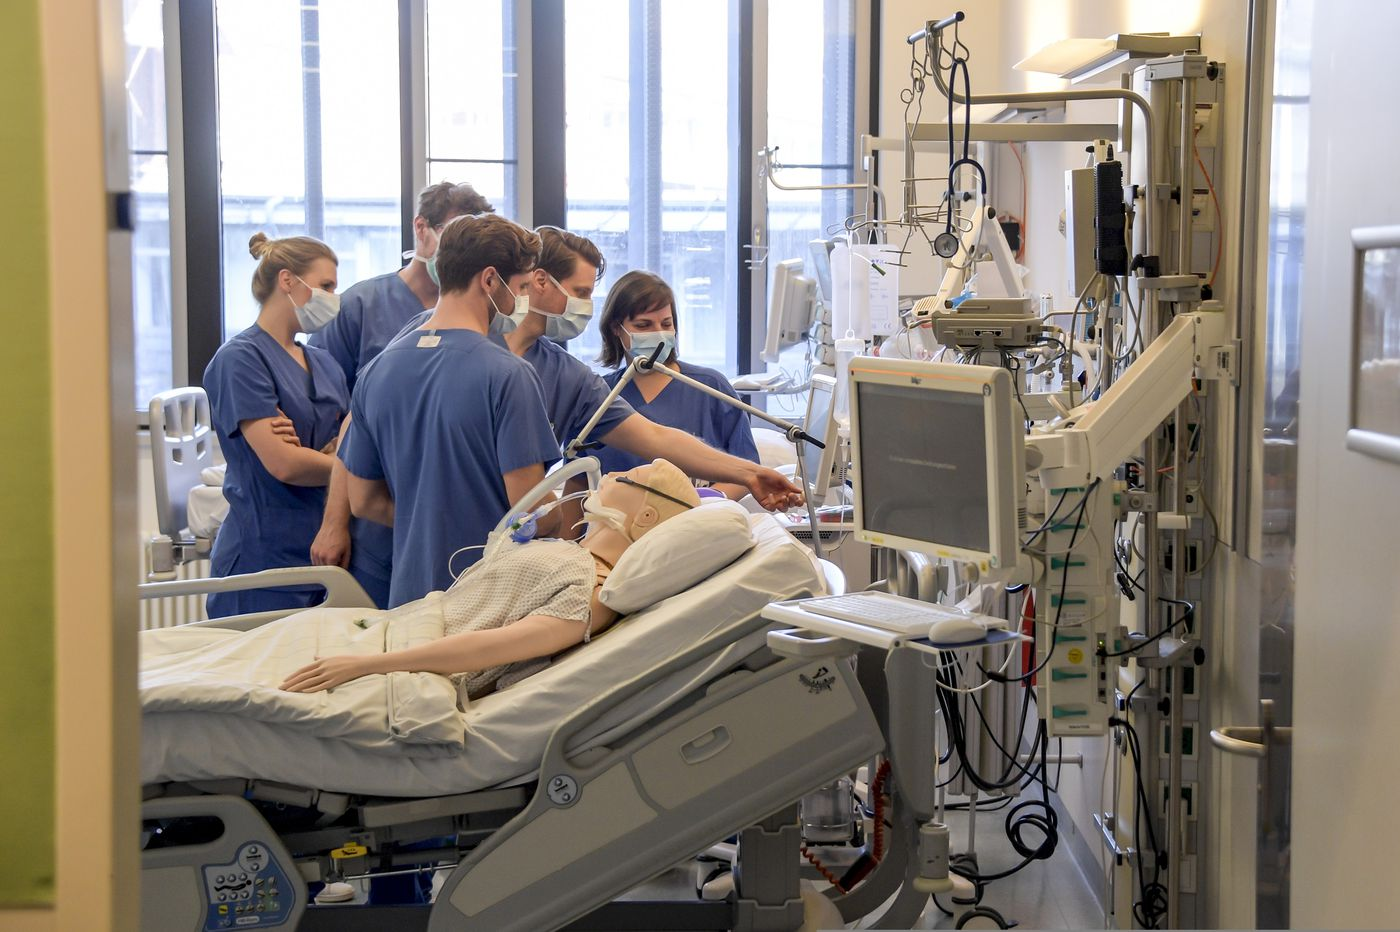 Coronavirus ventilator treatment could be hindered by drug shortage at hospitals